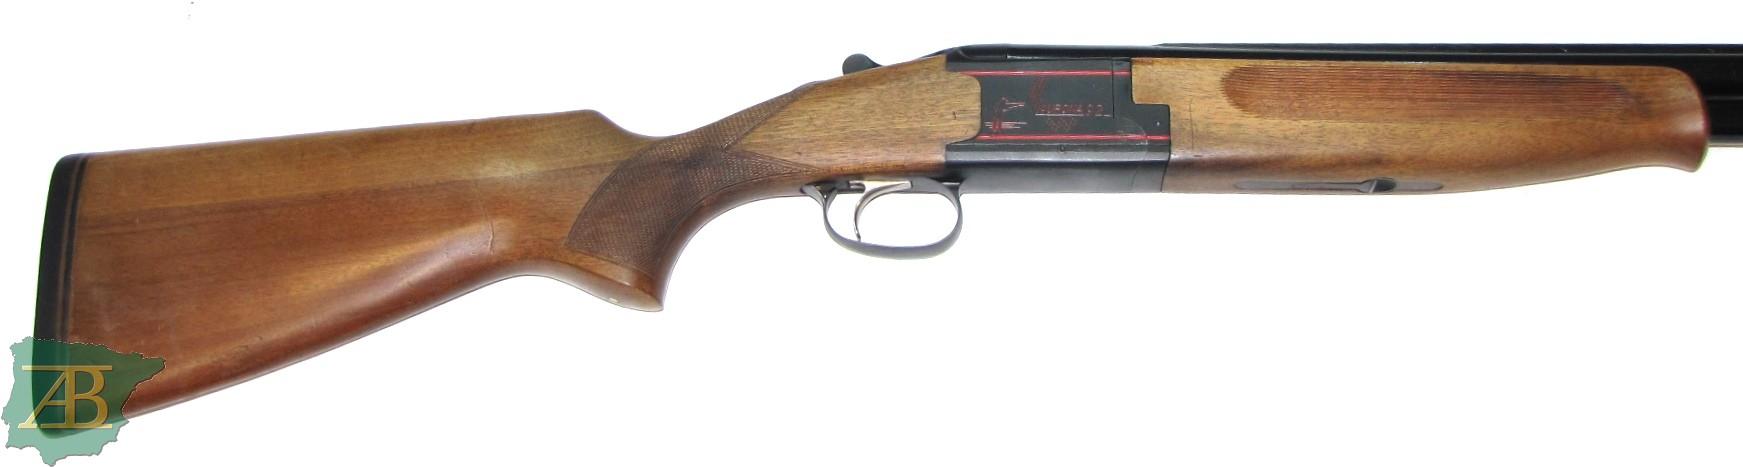 Escopeta superpuesta de caza LAURONA 92 Ref 5782-armeriaiberica-2